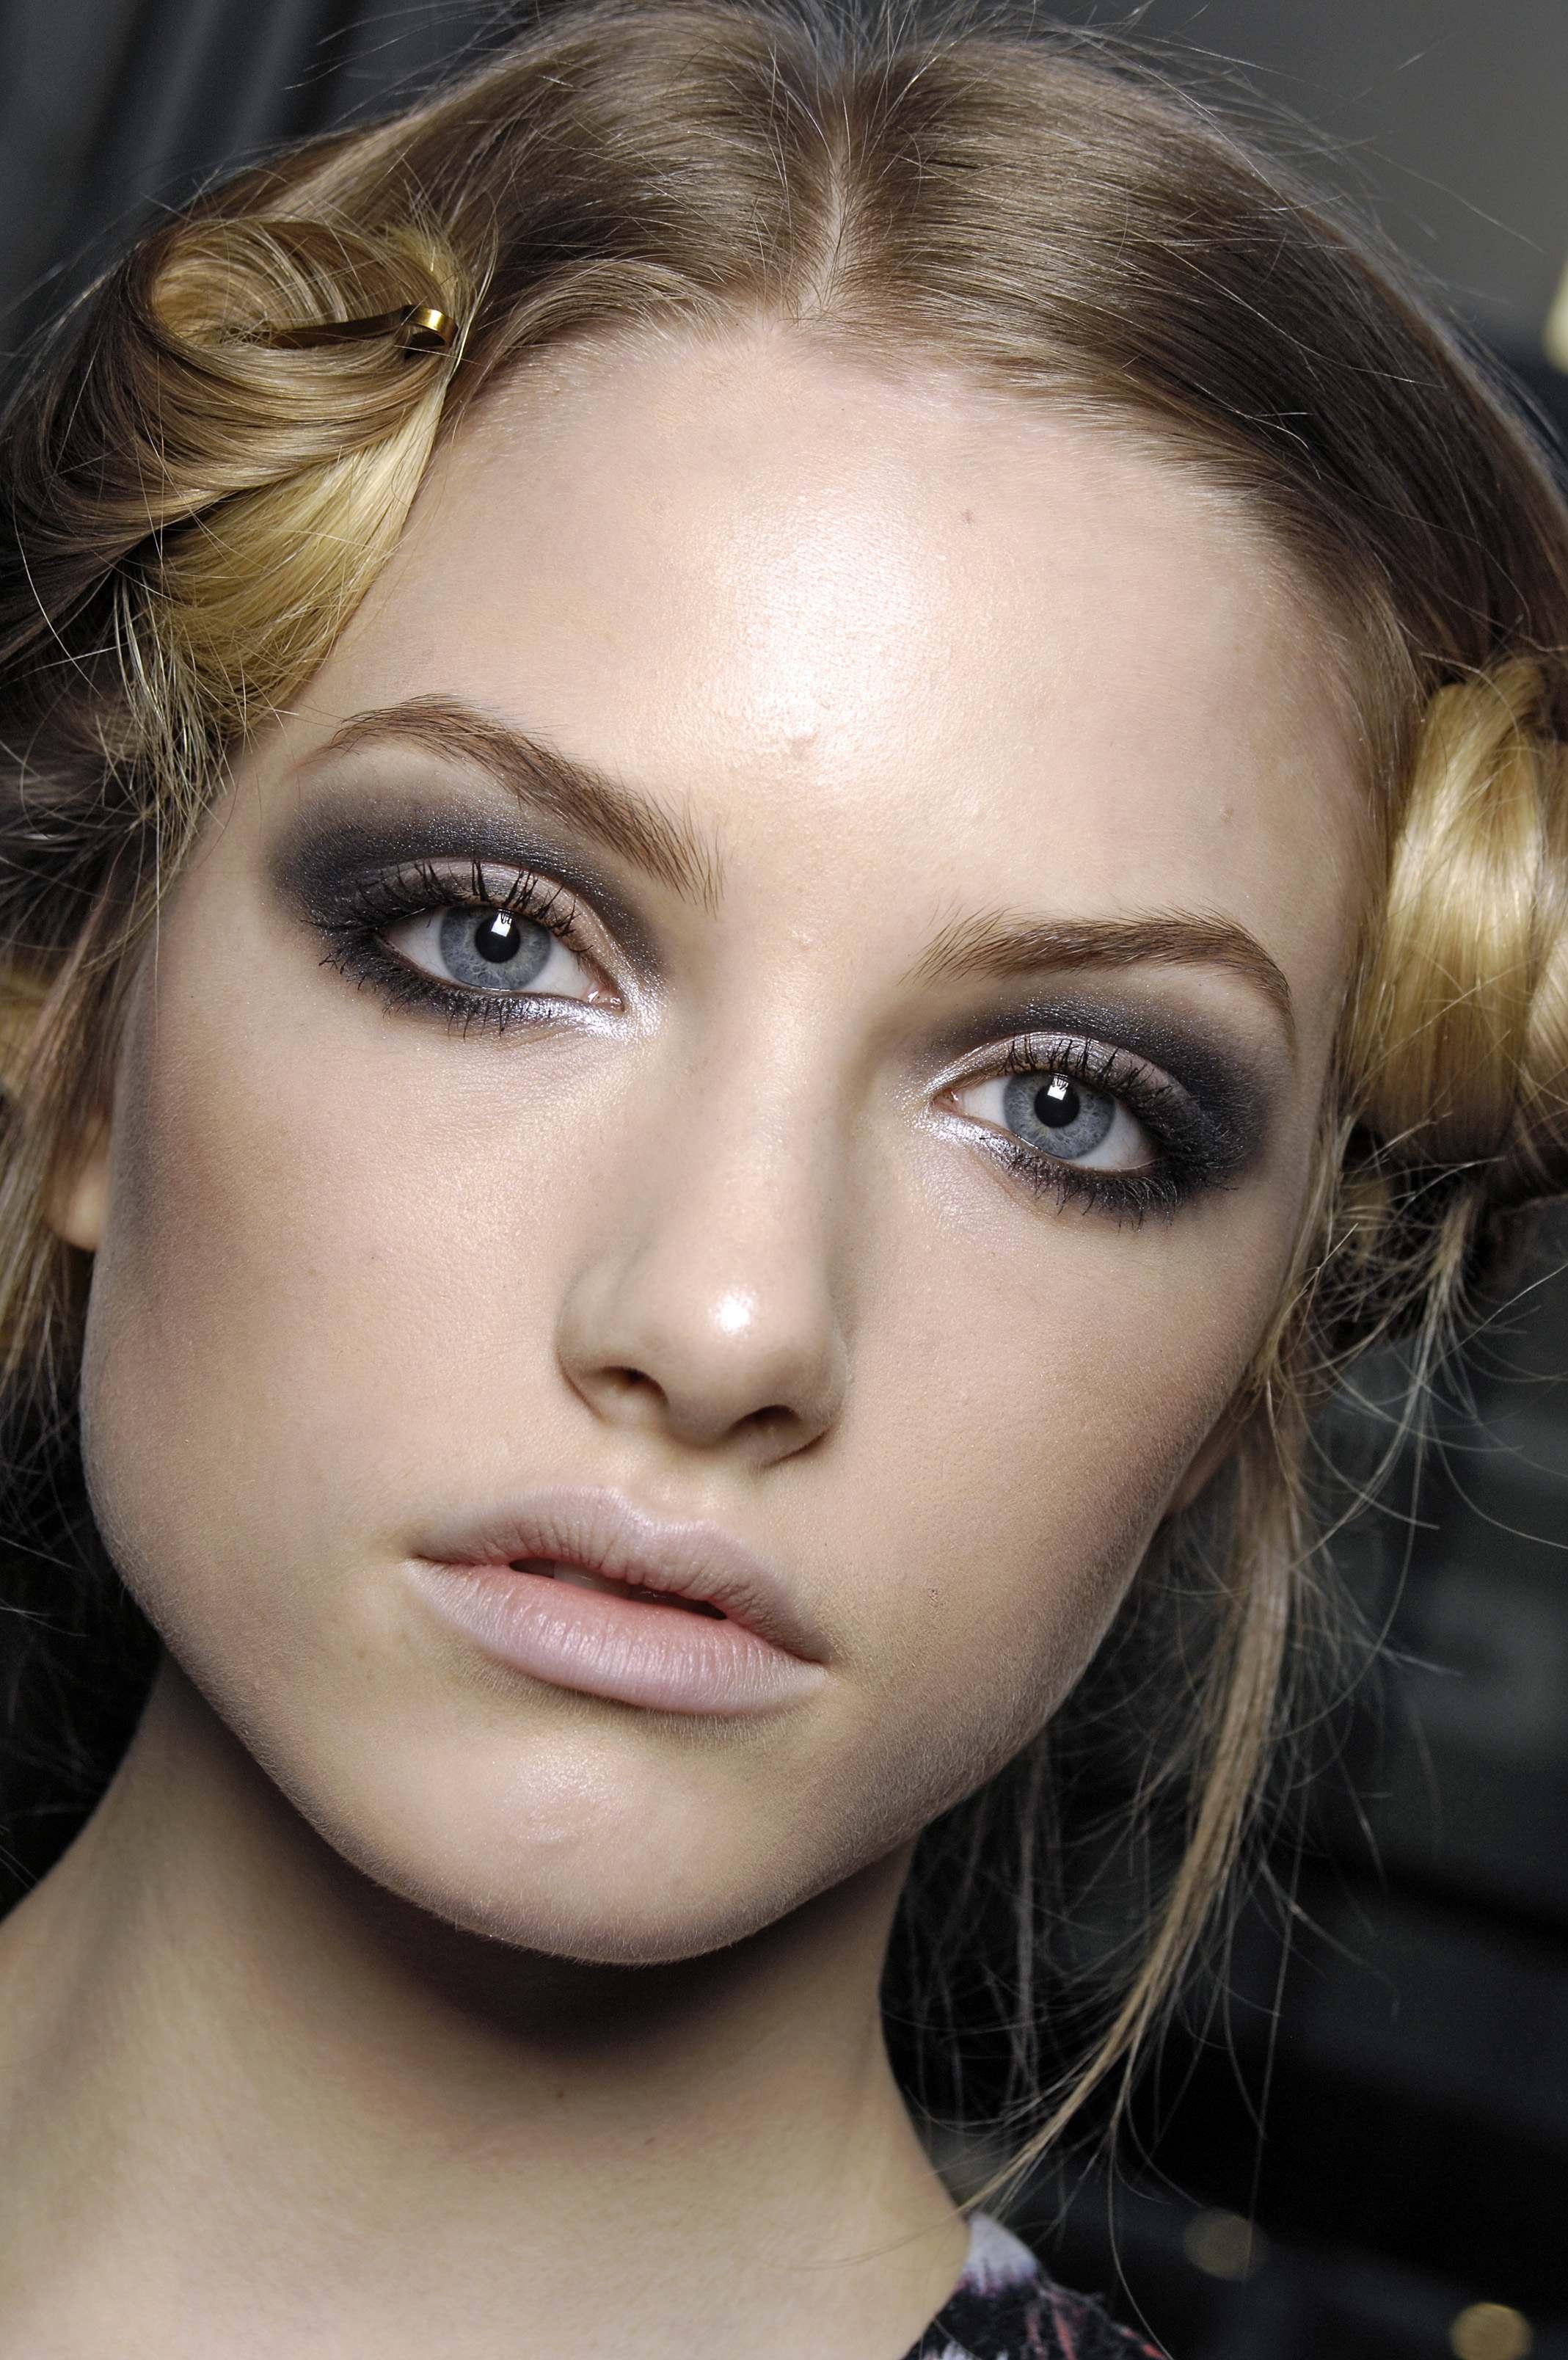 Smokey Eye Makeup Steps For Blue Eyes Card From User Svetkakicul